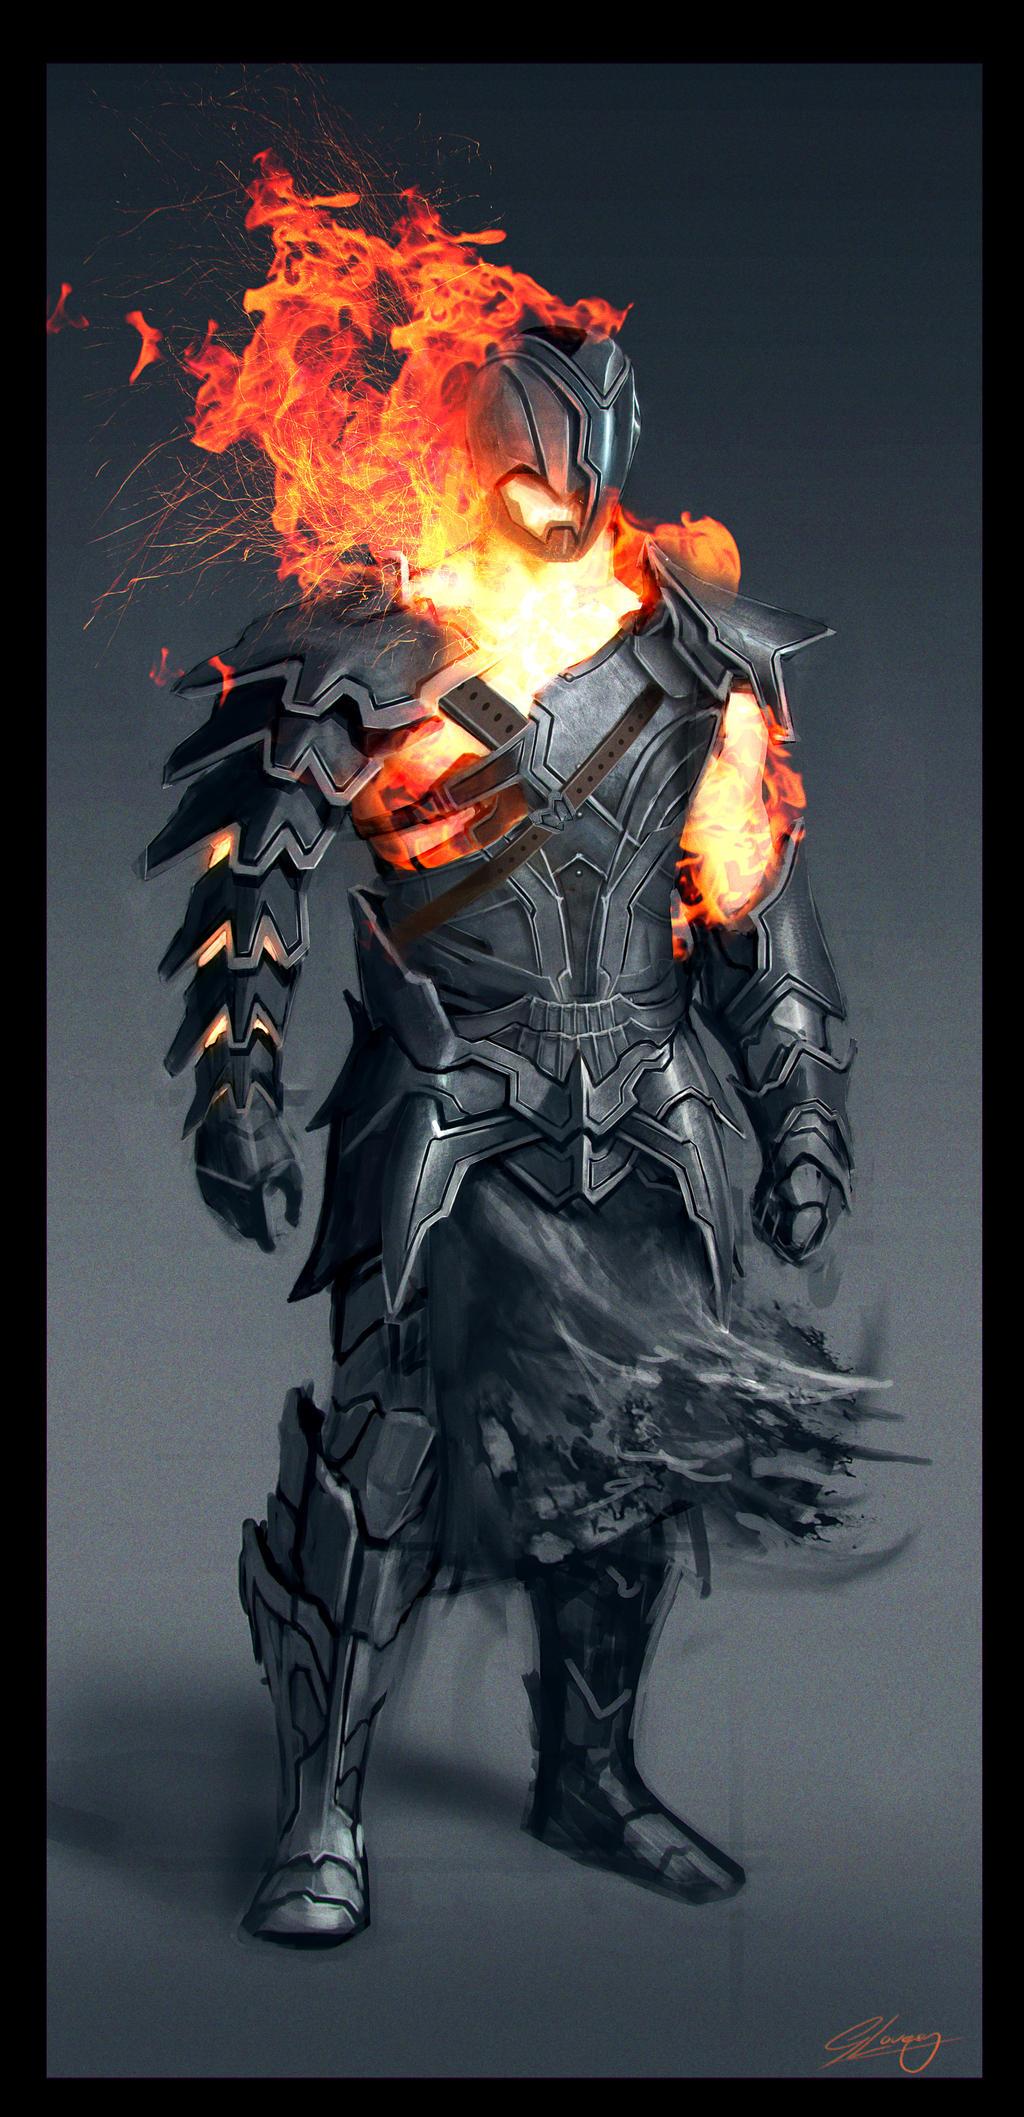 Fire Warrior by GeorgeLovesyArt